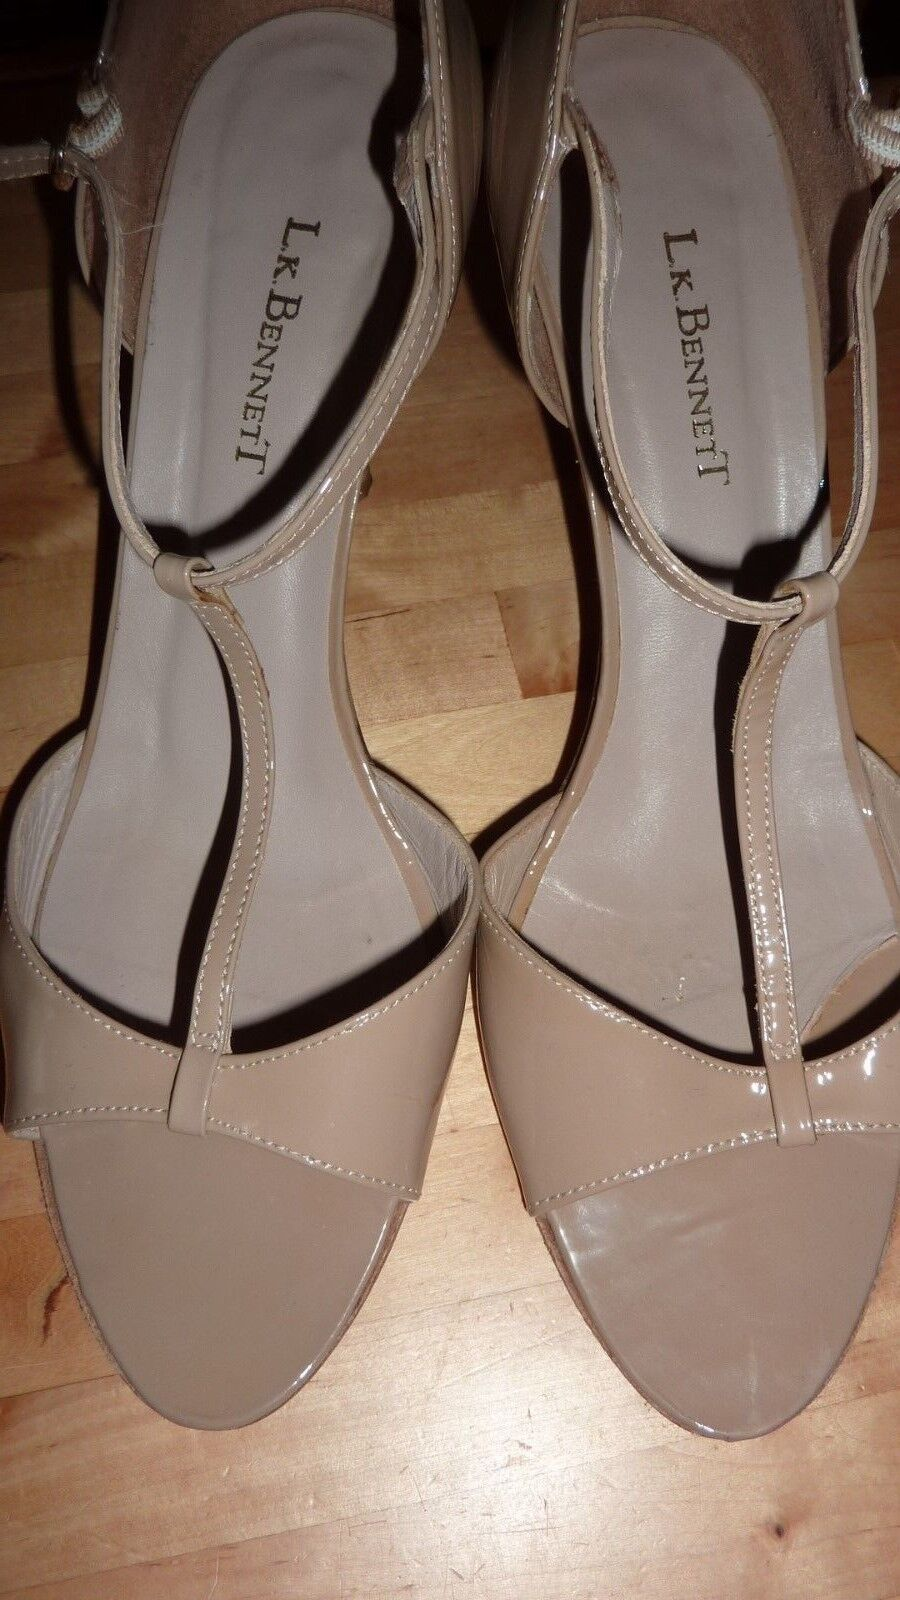 LK Bennett UK 7 40 taupe verni Beige Talons T Bar Sandale tribunaux Chaussures Fab RARE